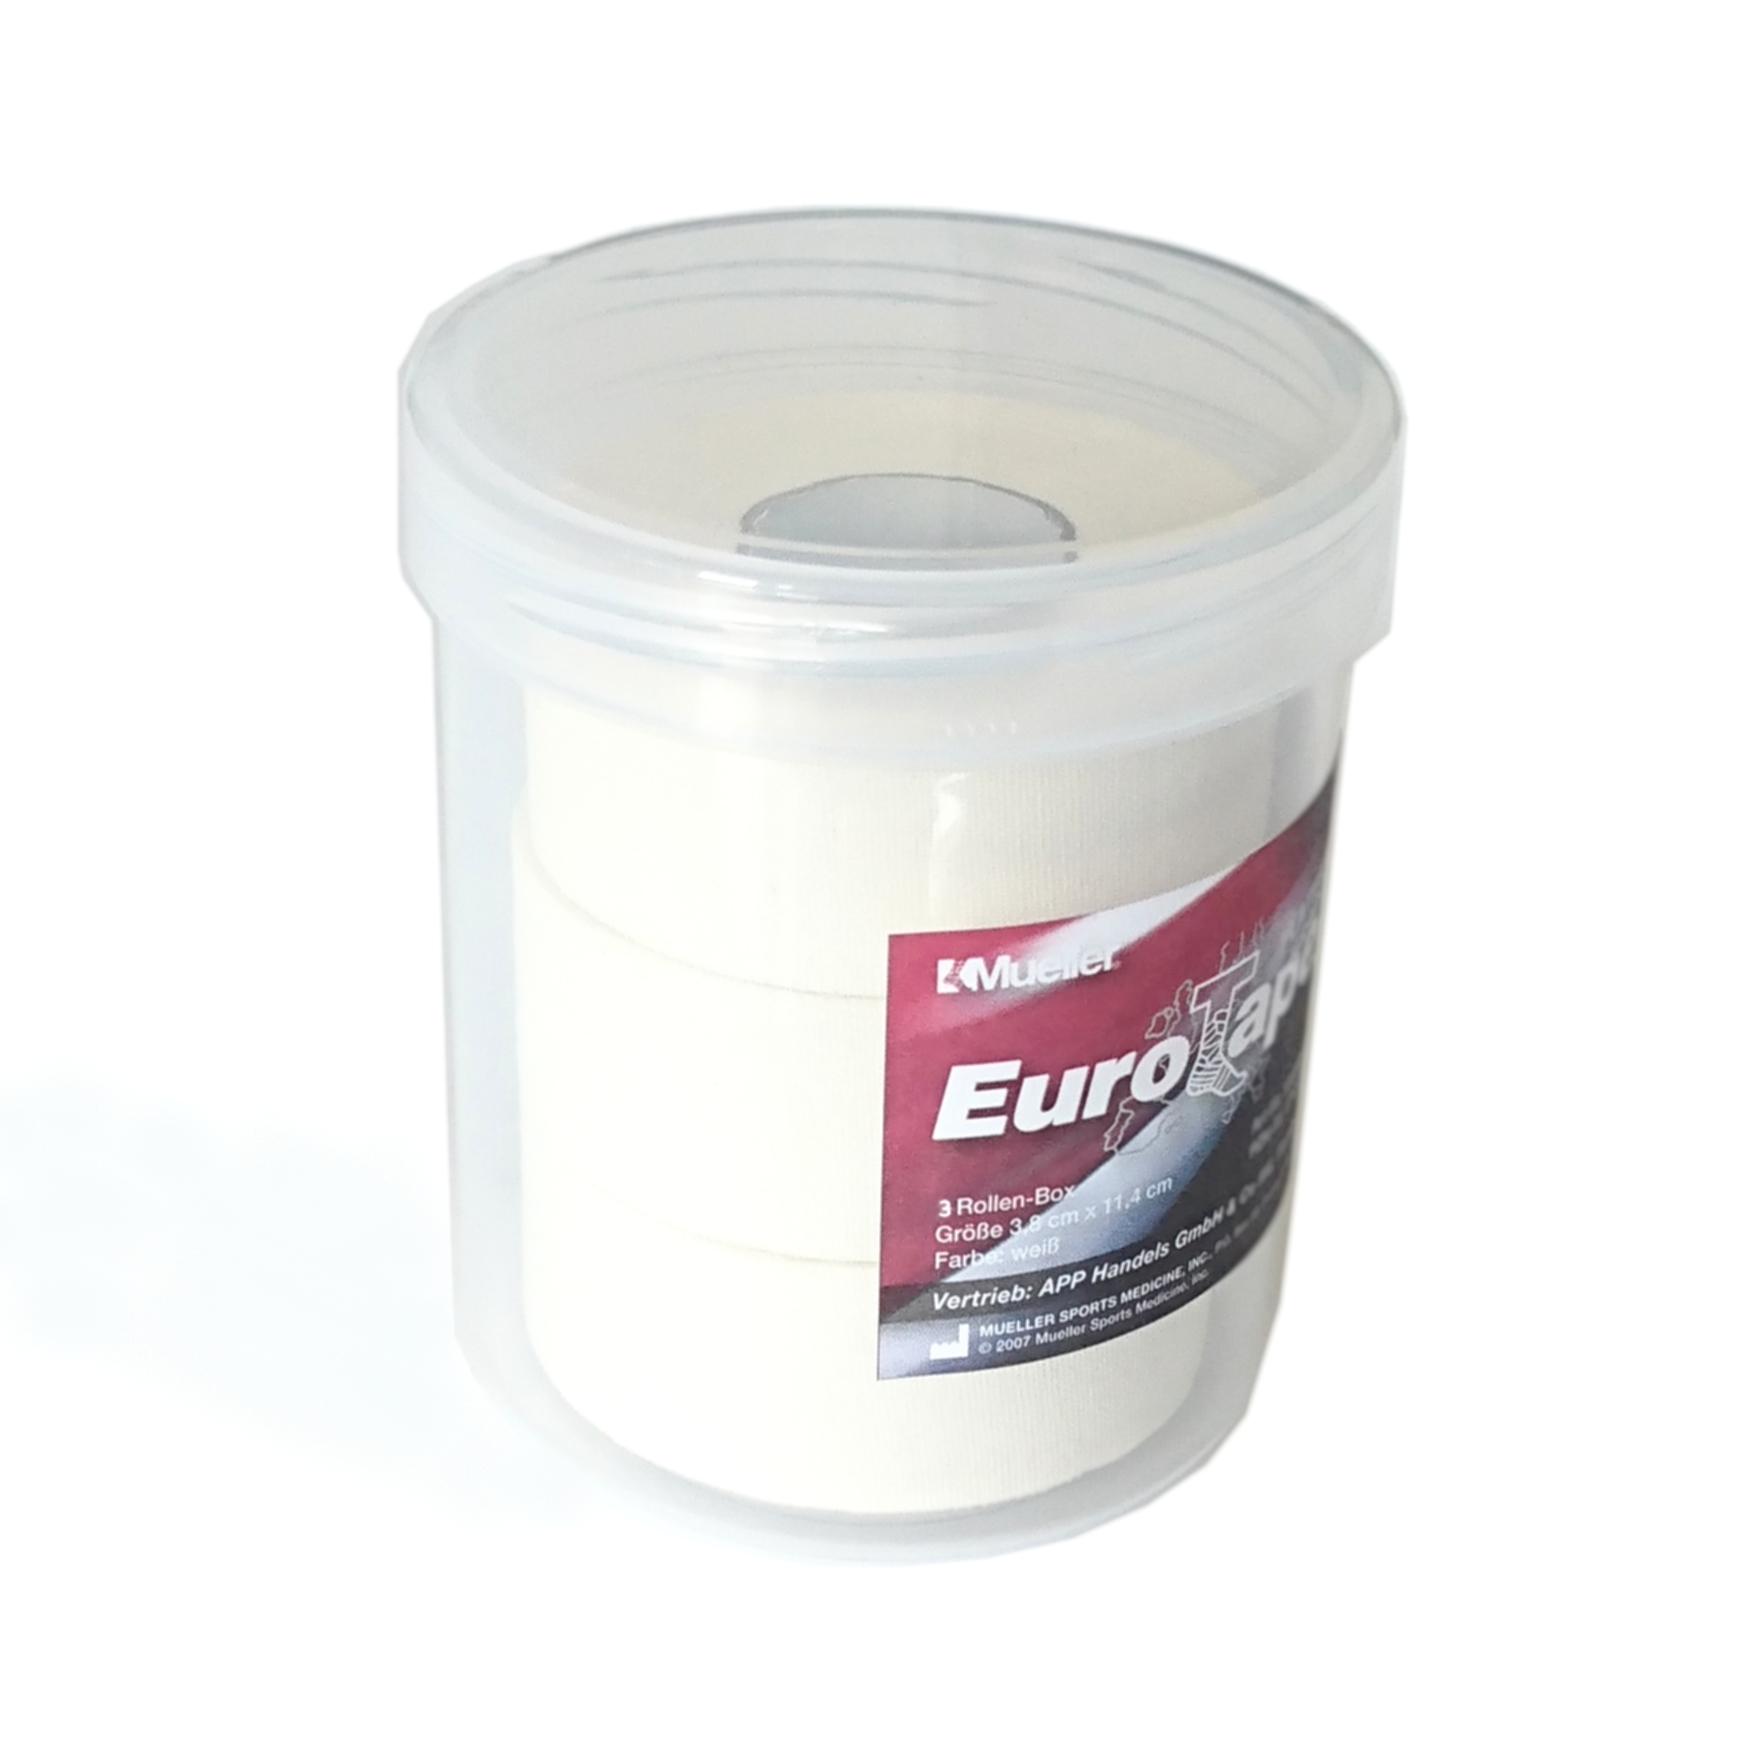 Mueller Platinum Euro Tape - Rollen-Box - 2,5cm